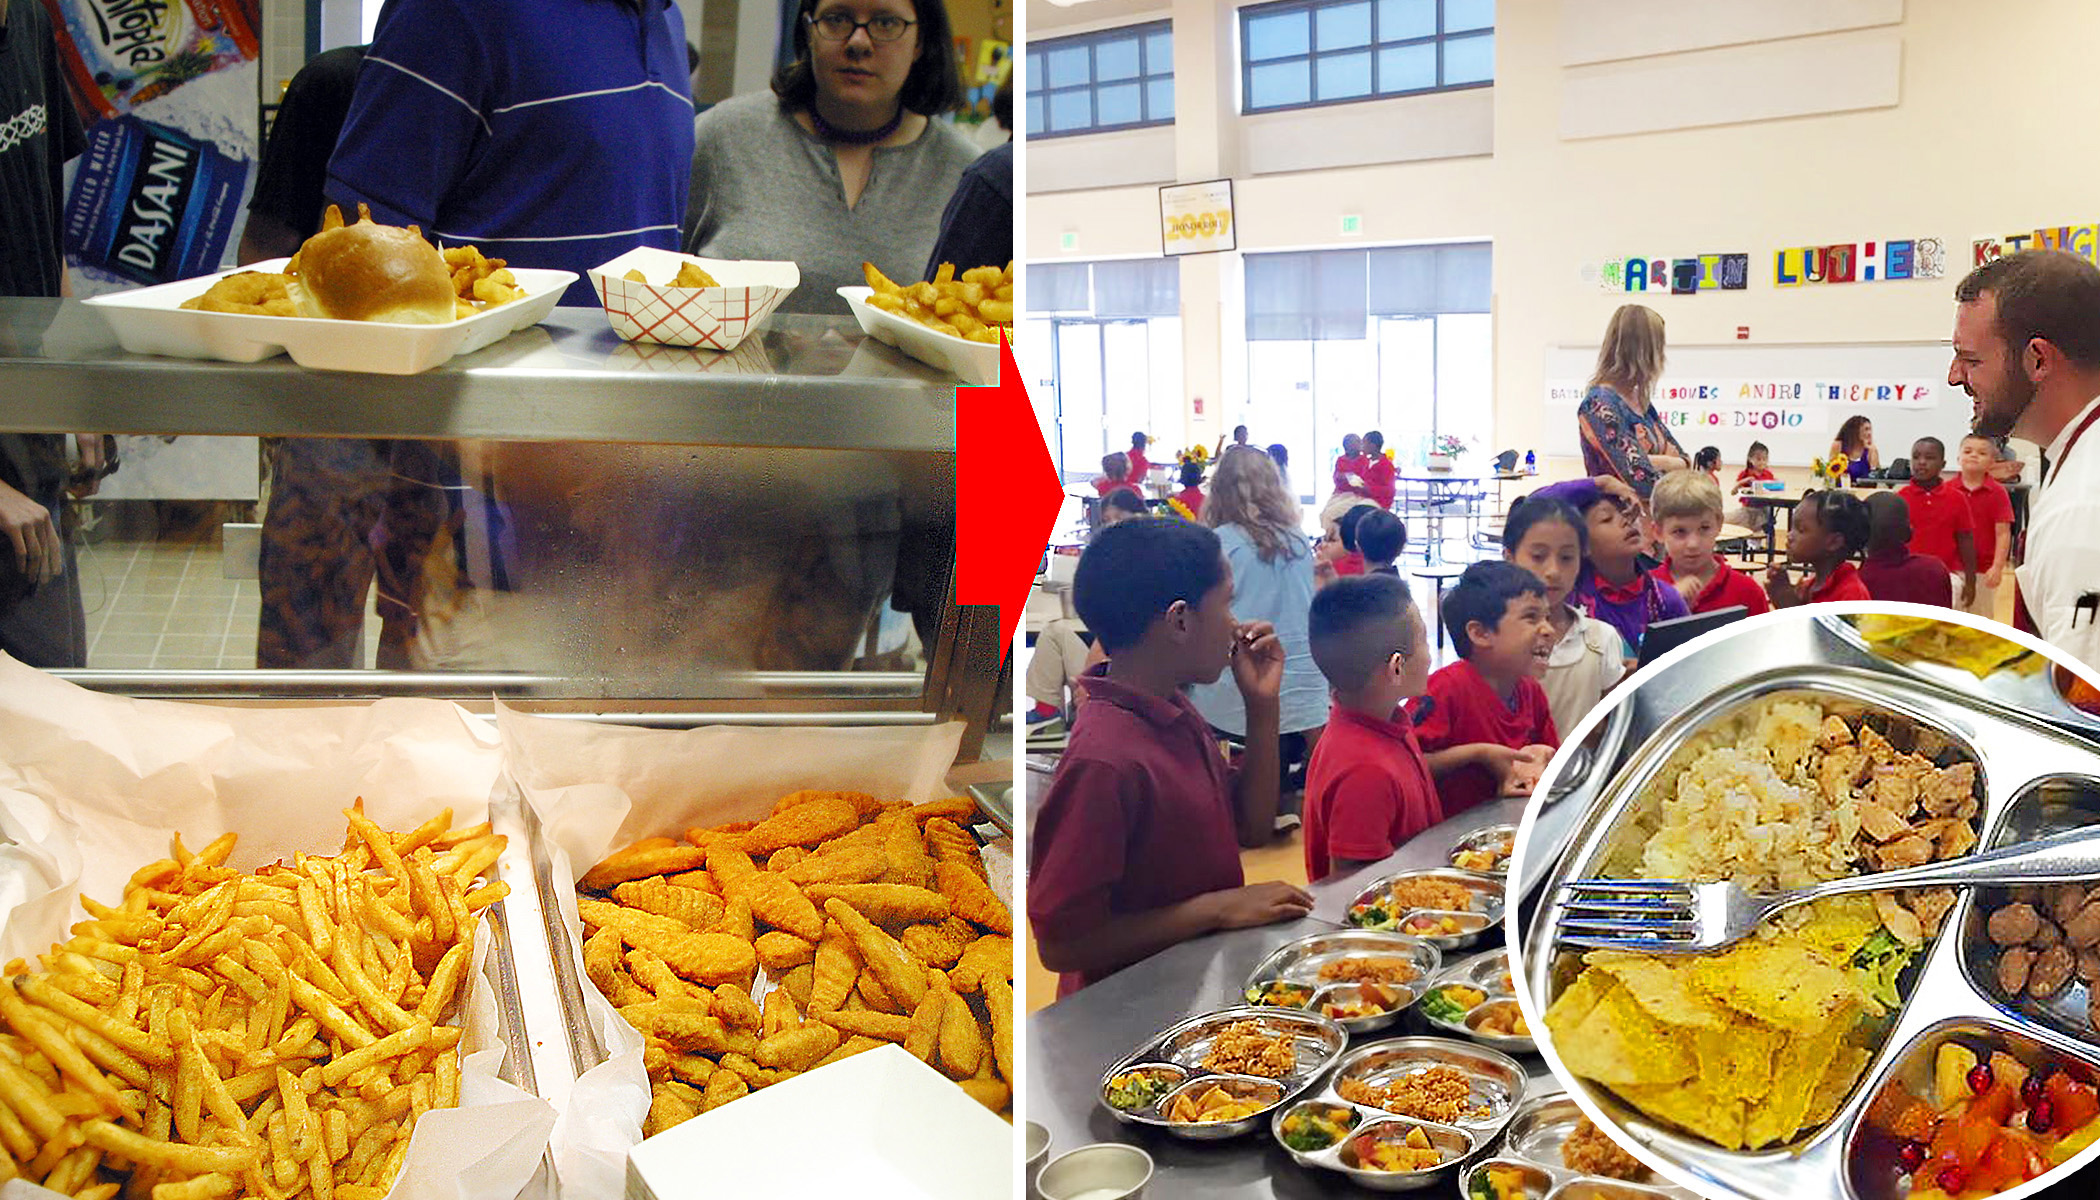 Cafeteria Food in Cali Schools Goes Non-GMO, Organic, Shifting School Service Paradigm